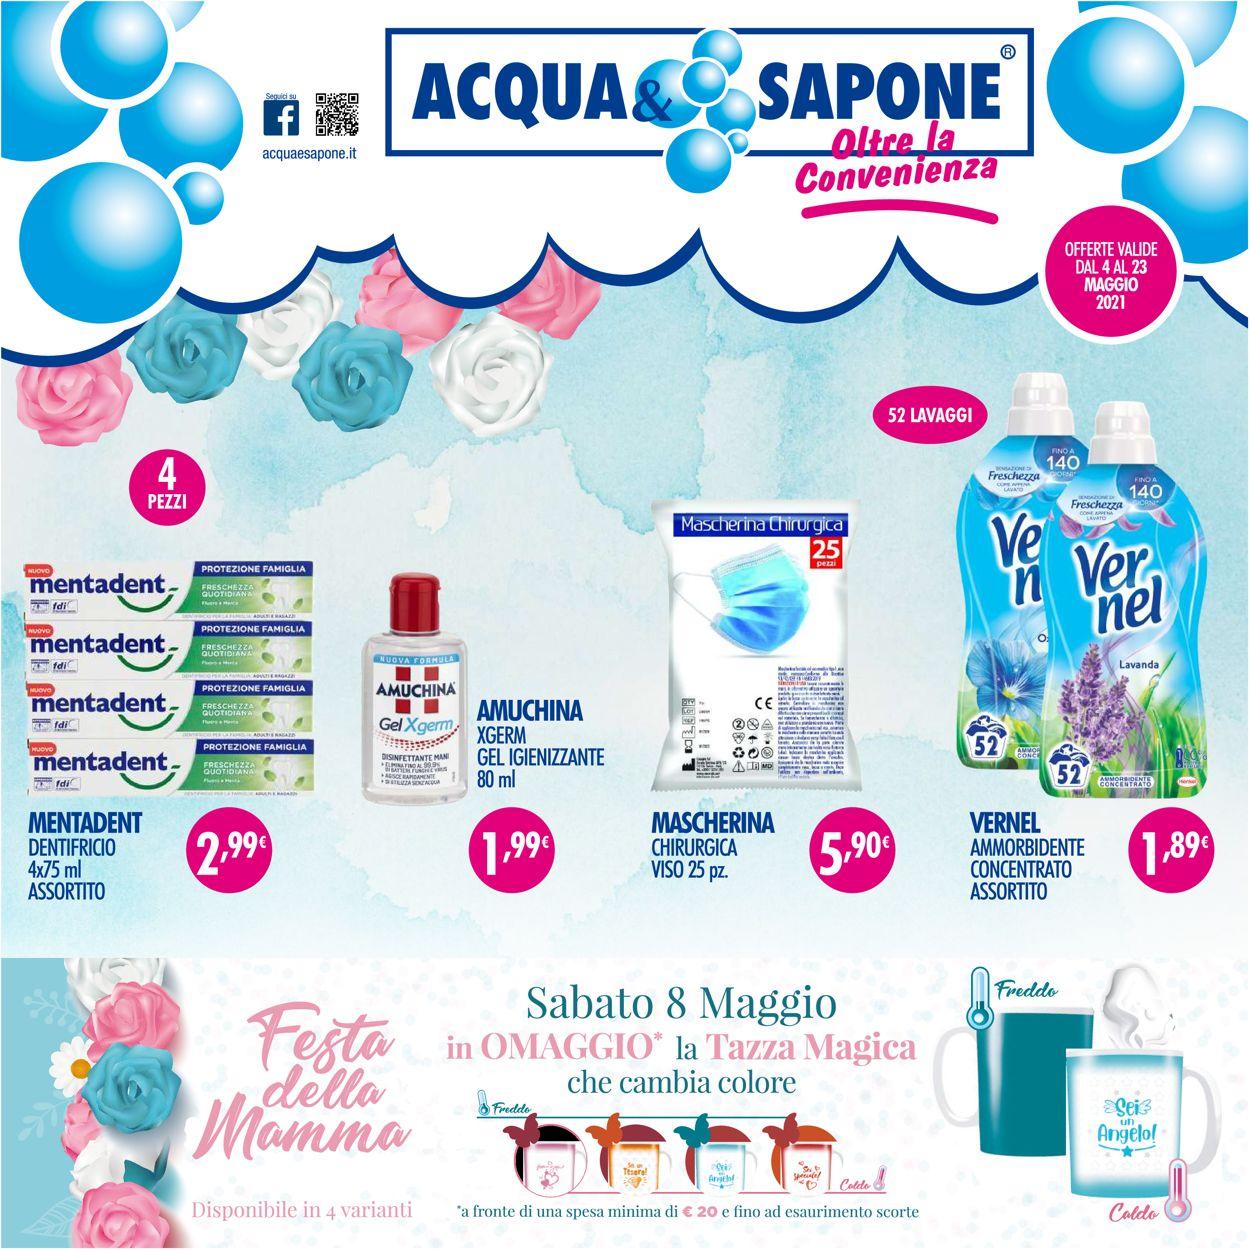 Volantino Acqua & Sapone - Offerte 04/05-23/05/2021